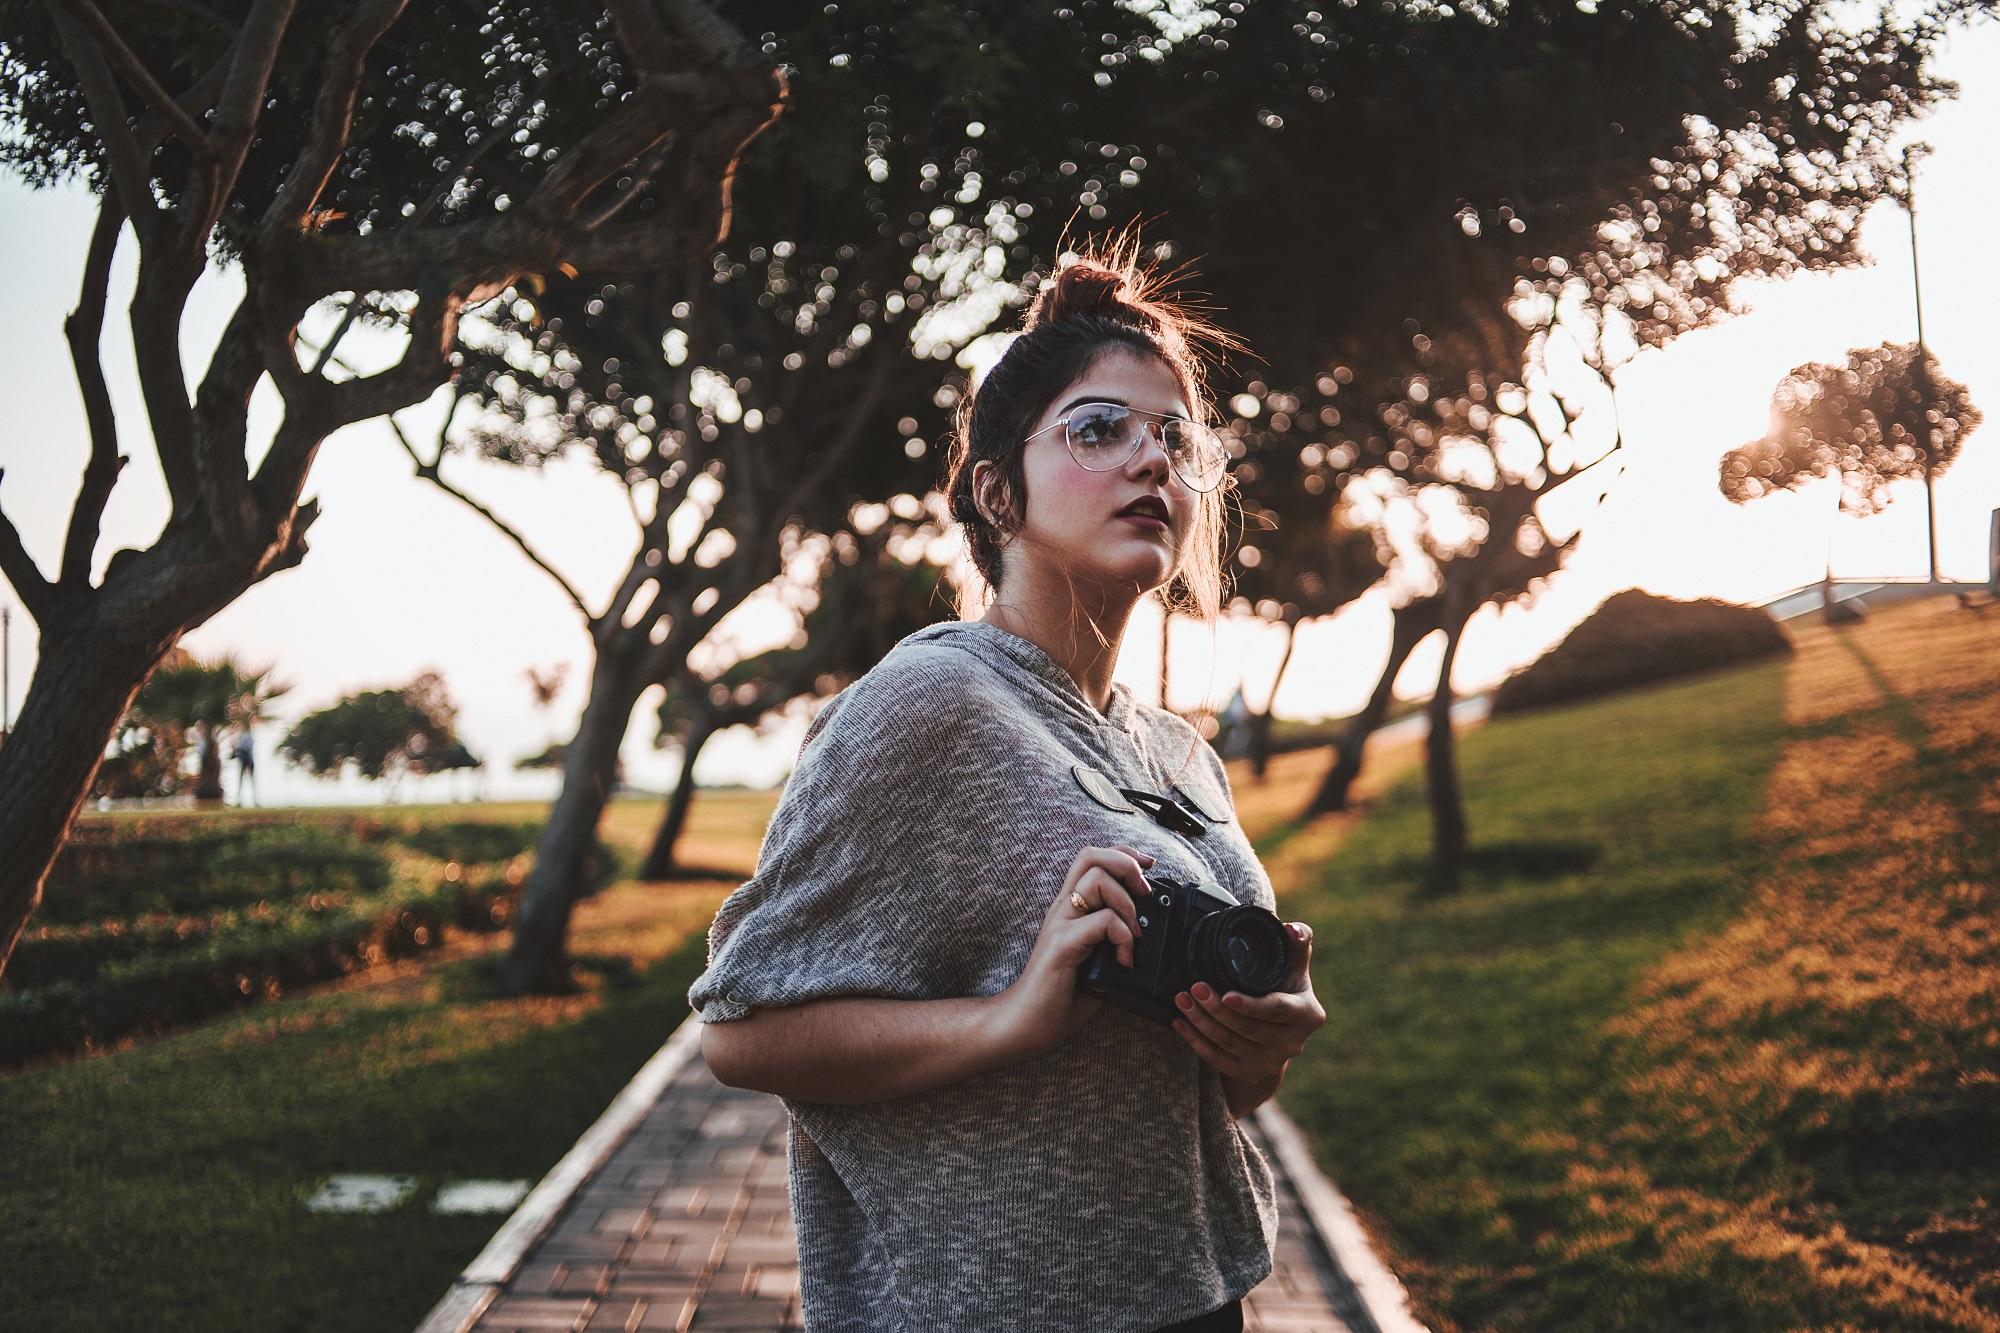 woman-photographer-park